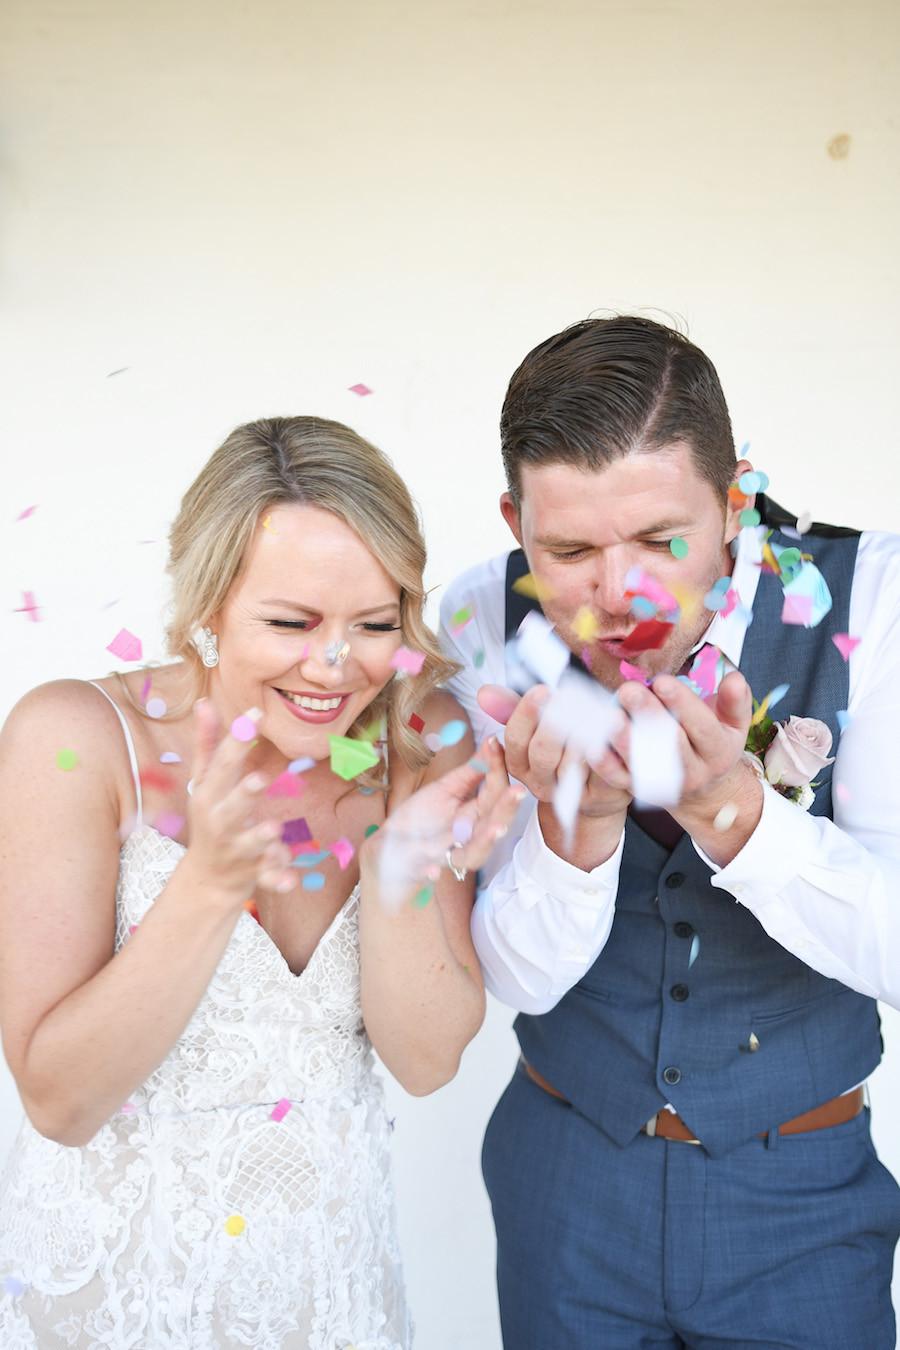 Wedding confetti photo